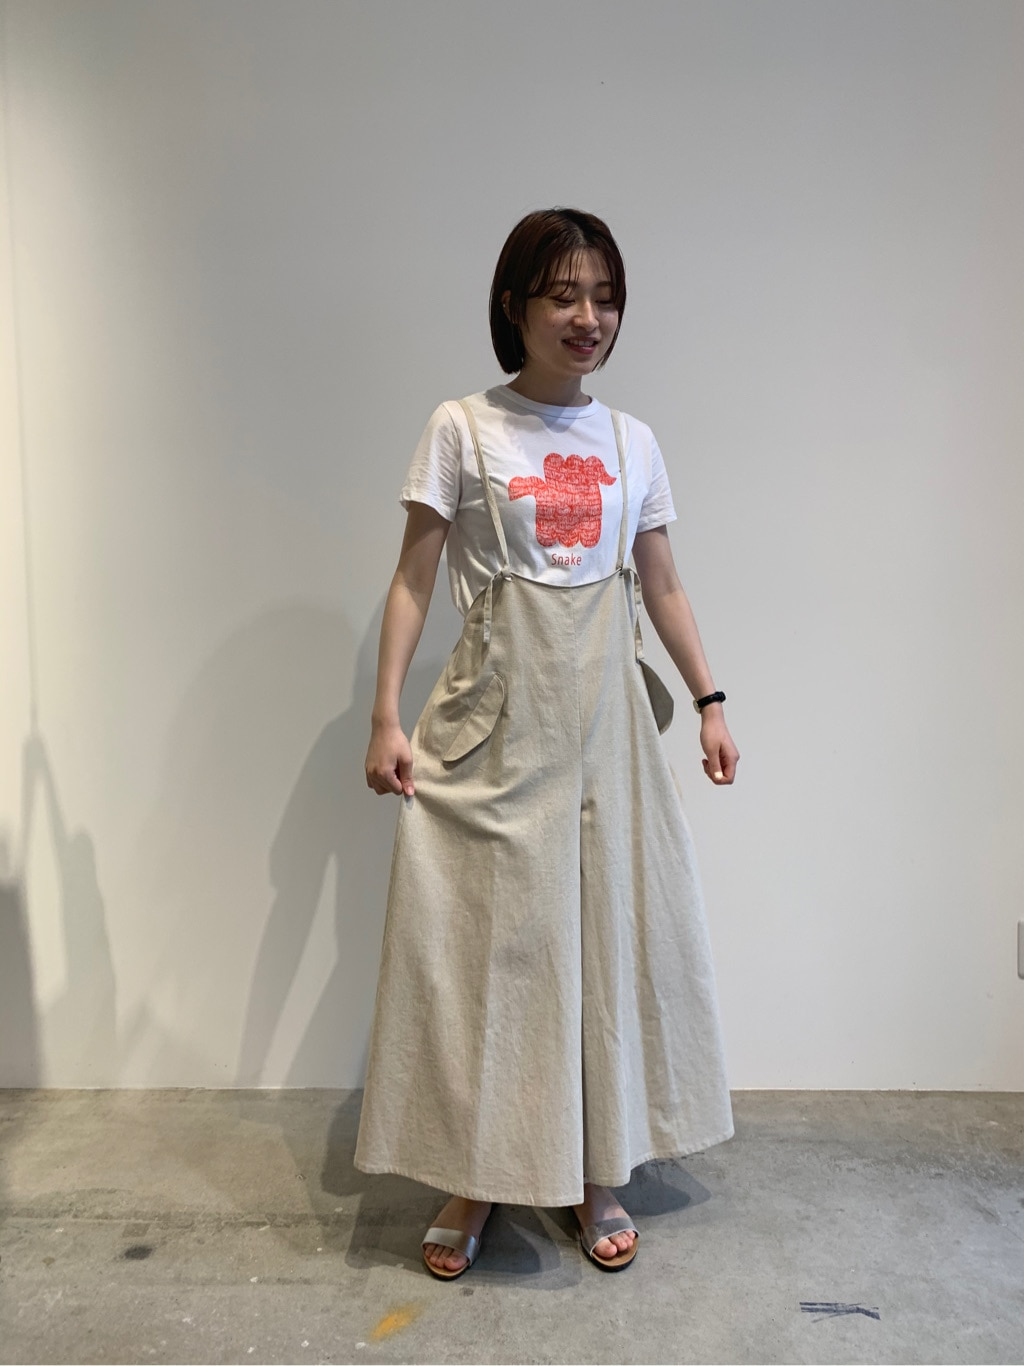 - bulle de savon FLAT AMB 名古屋栄路面 身長:162cm 2020.07.29